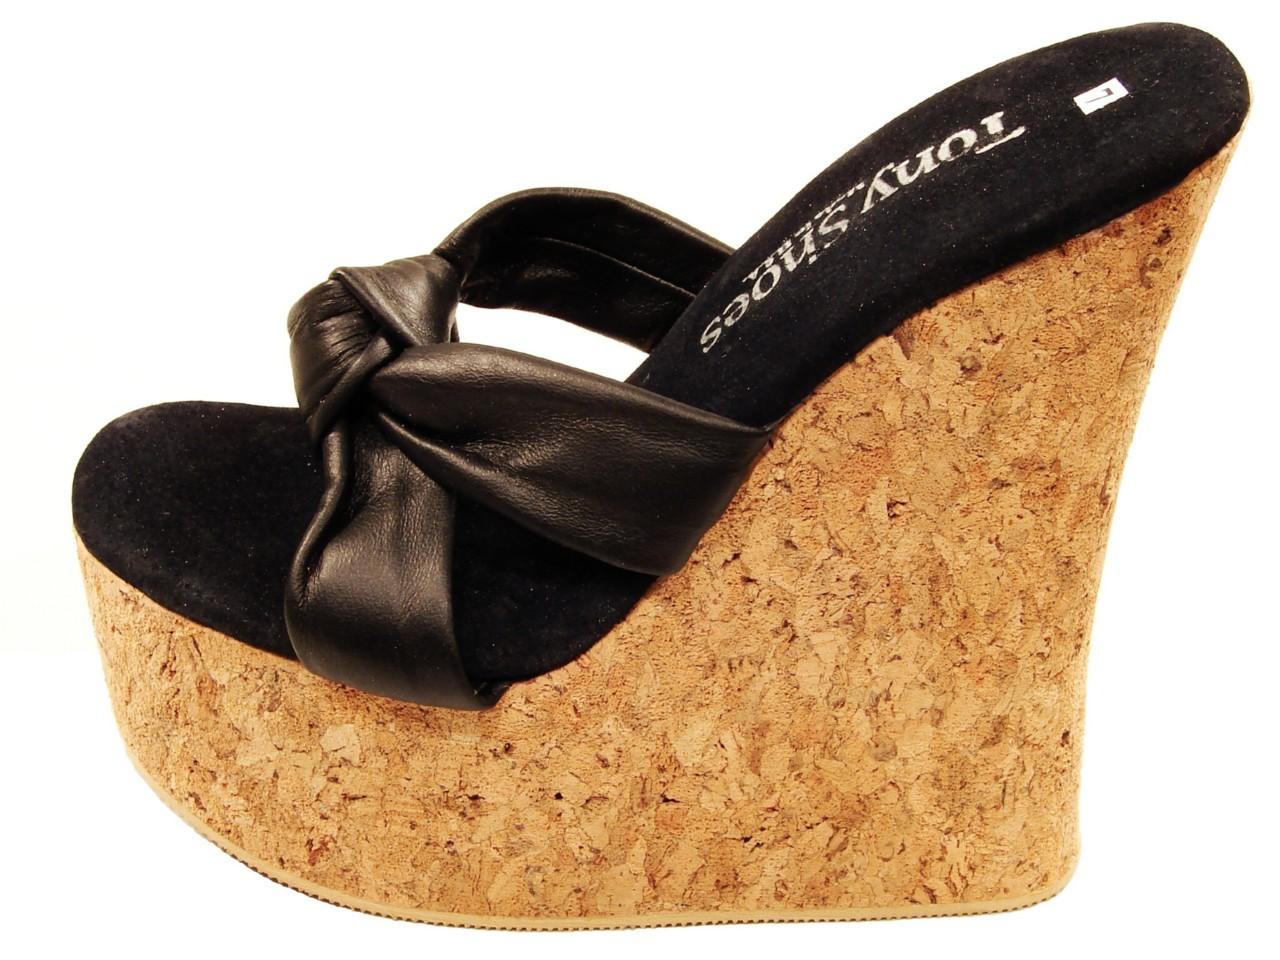 Tony Cbqredxow 533 Black Wedge Cork Shoes Sandals Platform W pVqUSLzGM